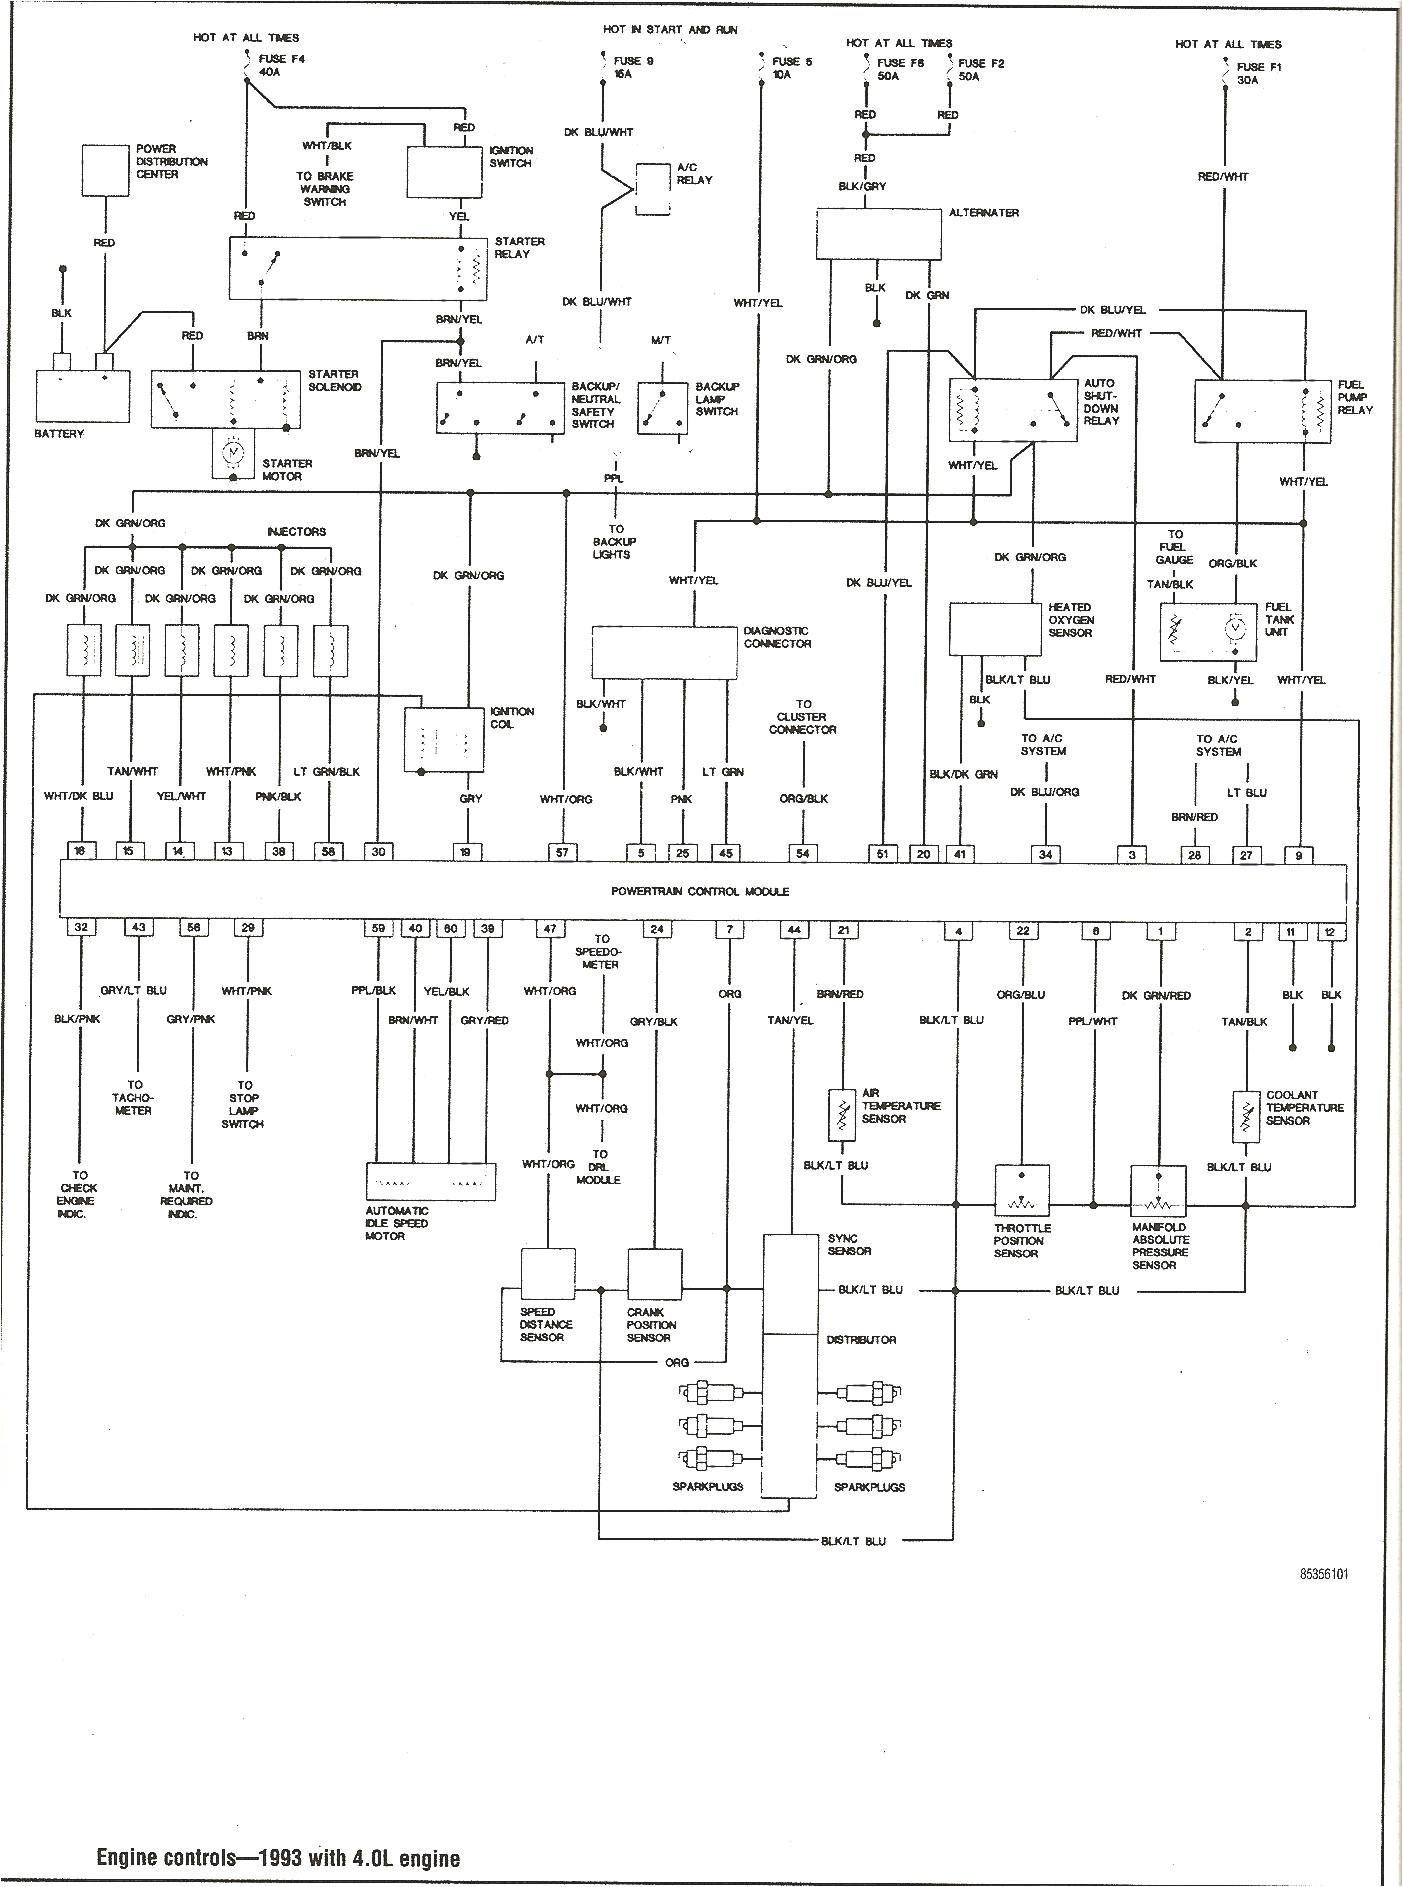 1991 jeep wrangler wiring diagram wiring diagram mega 1991 jeep wrangler ignition wiring diagram wiring diagram